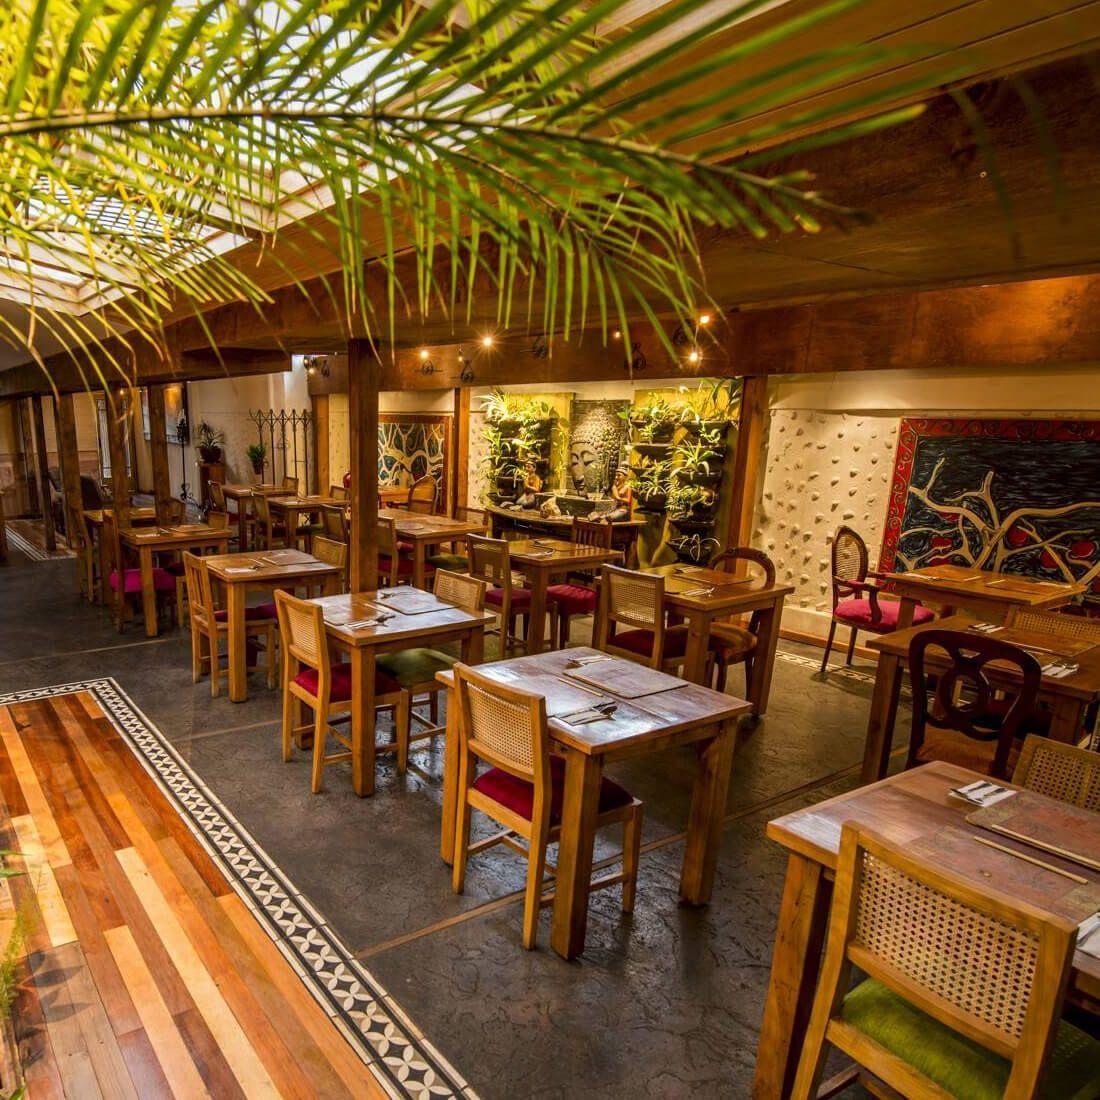 PAD THAI Restaurante - Reserva en restaurantes de Comida THAI - PROVIDENCIA - MESA 24/7 | SANTIAGO - Perú